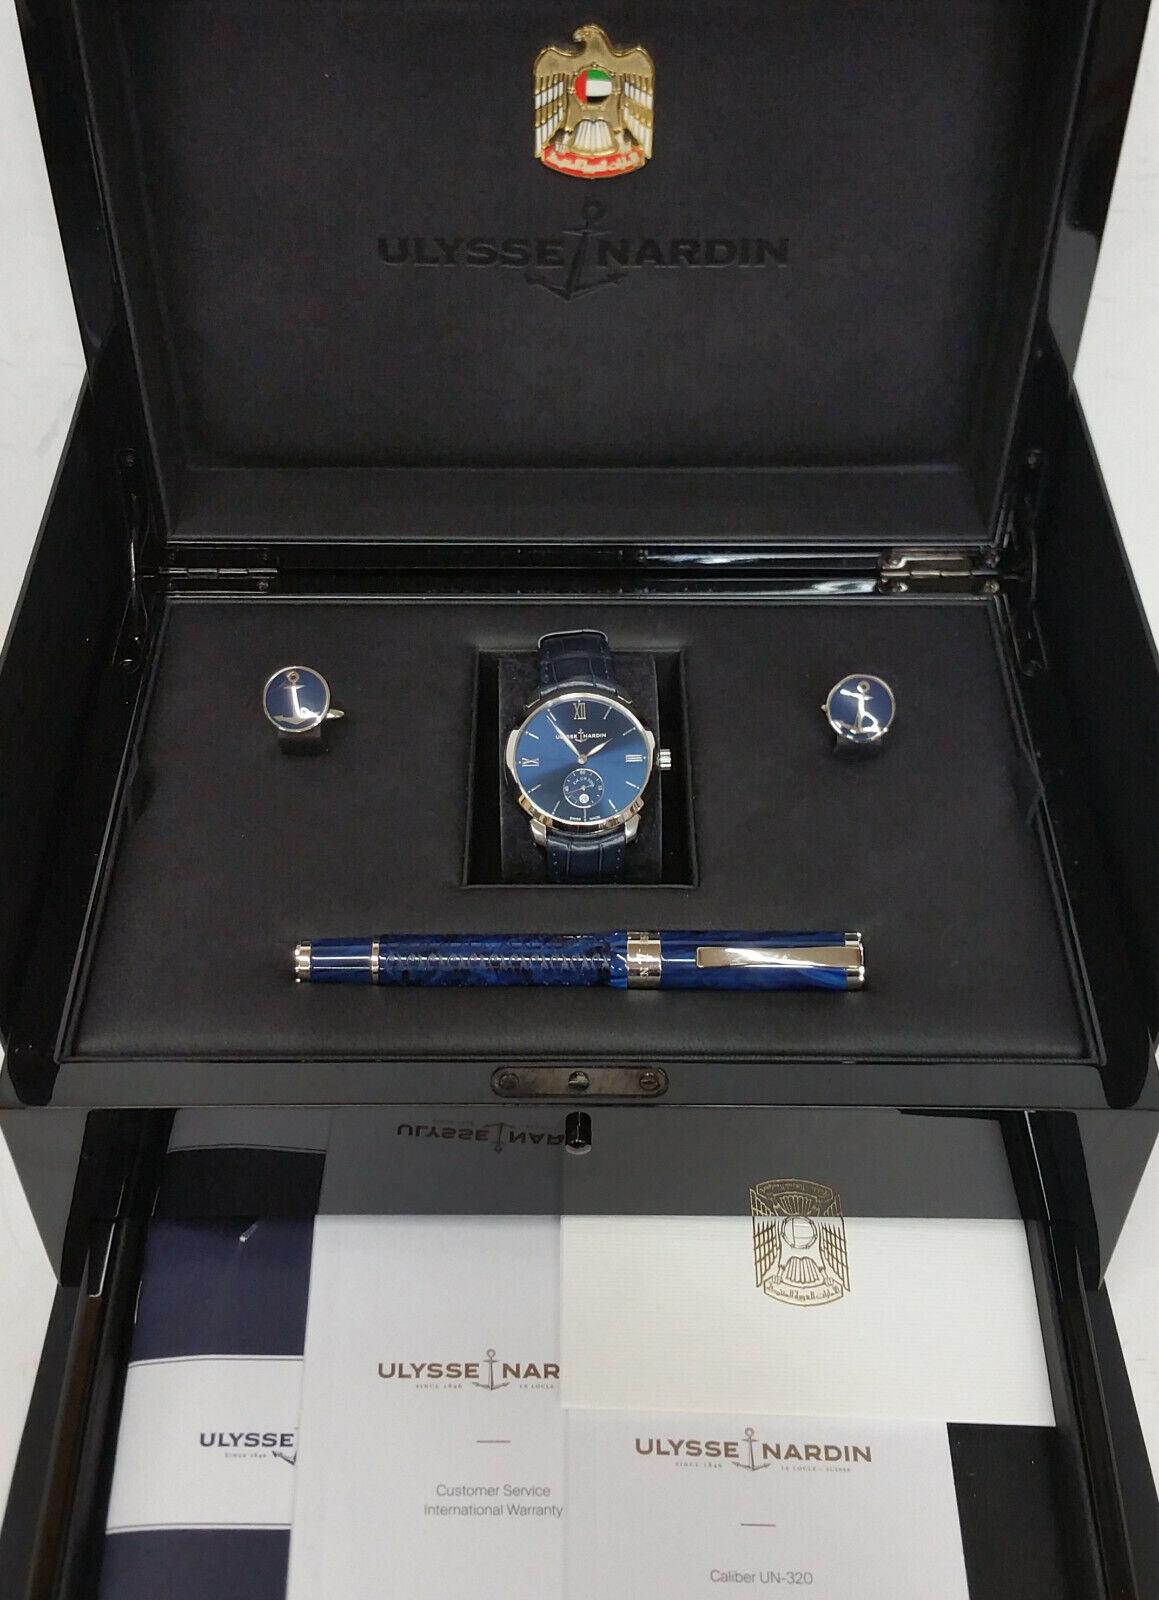 Saudi Sheik gift UN-320 Ulysse Nardin Classico Set Watch Box Paper Pen cufflinks - watch picture 1